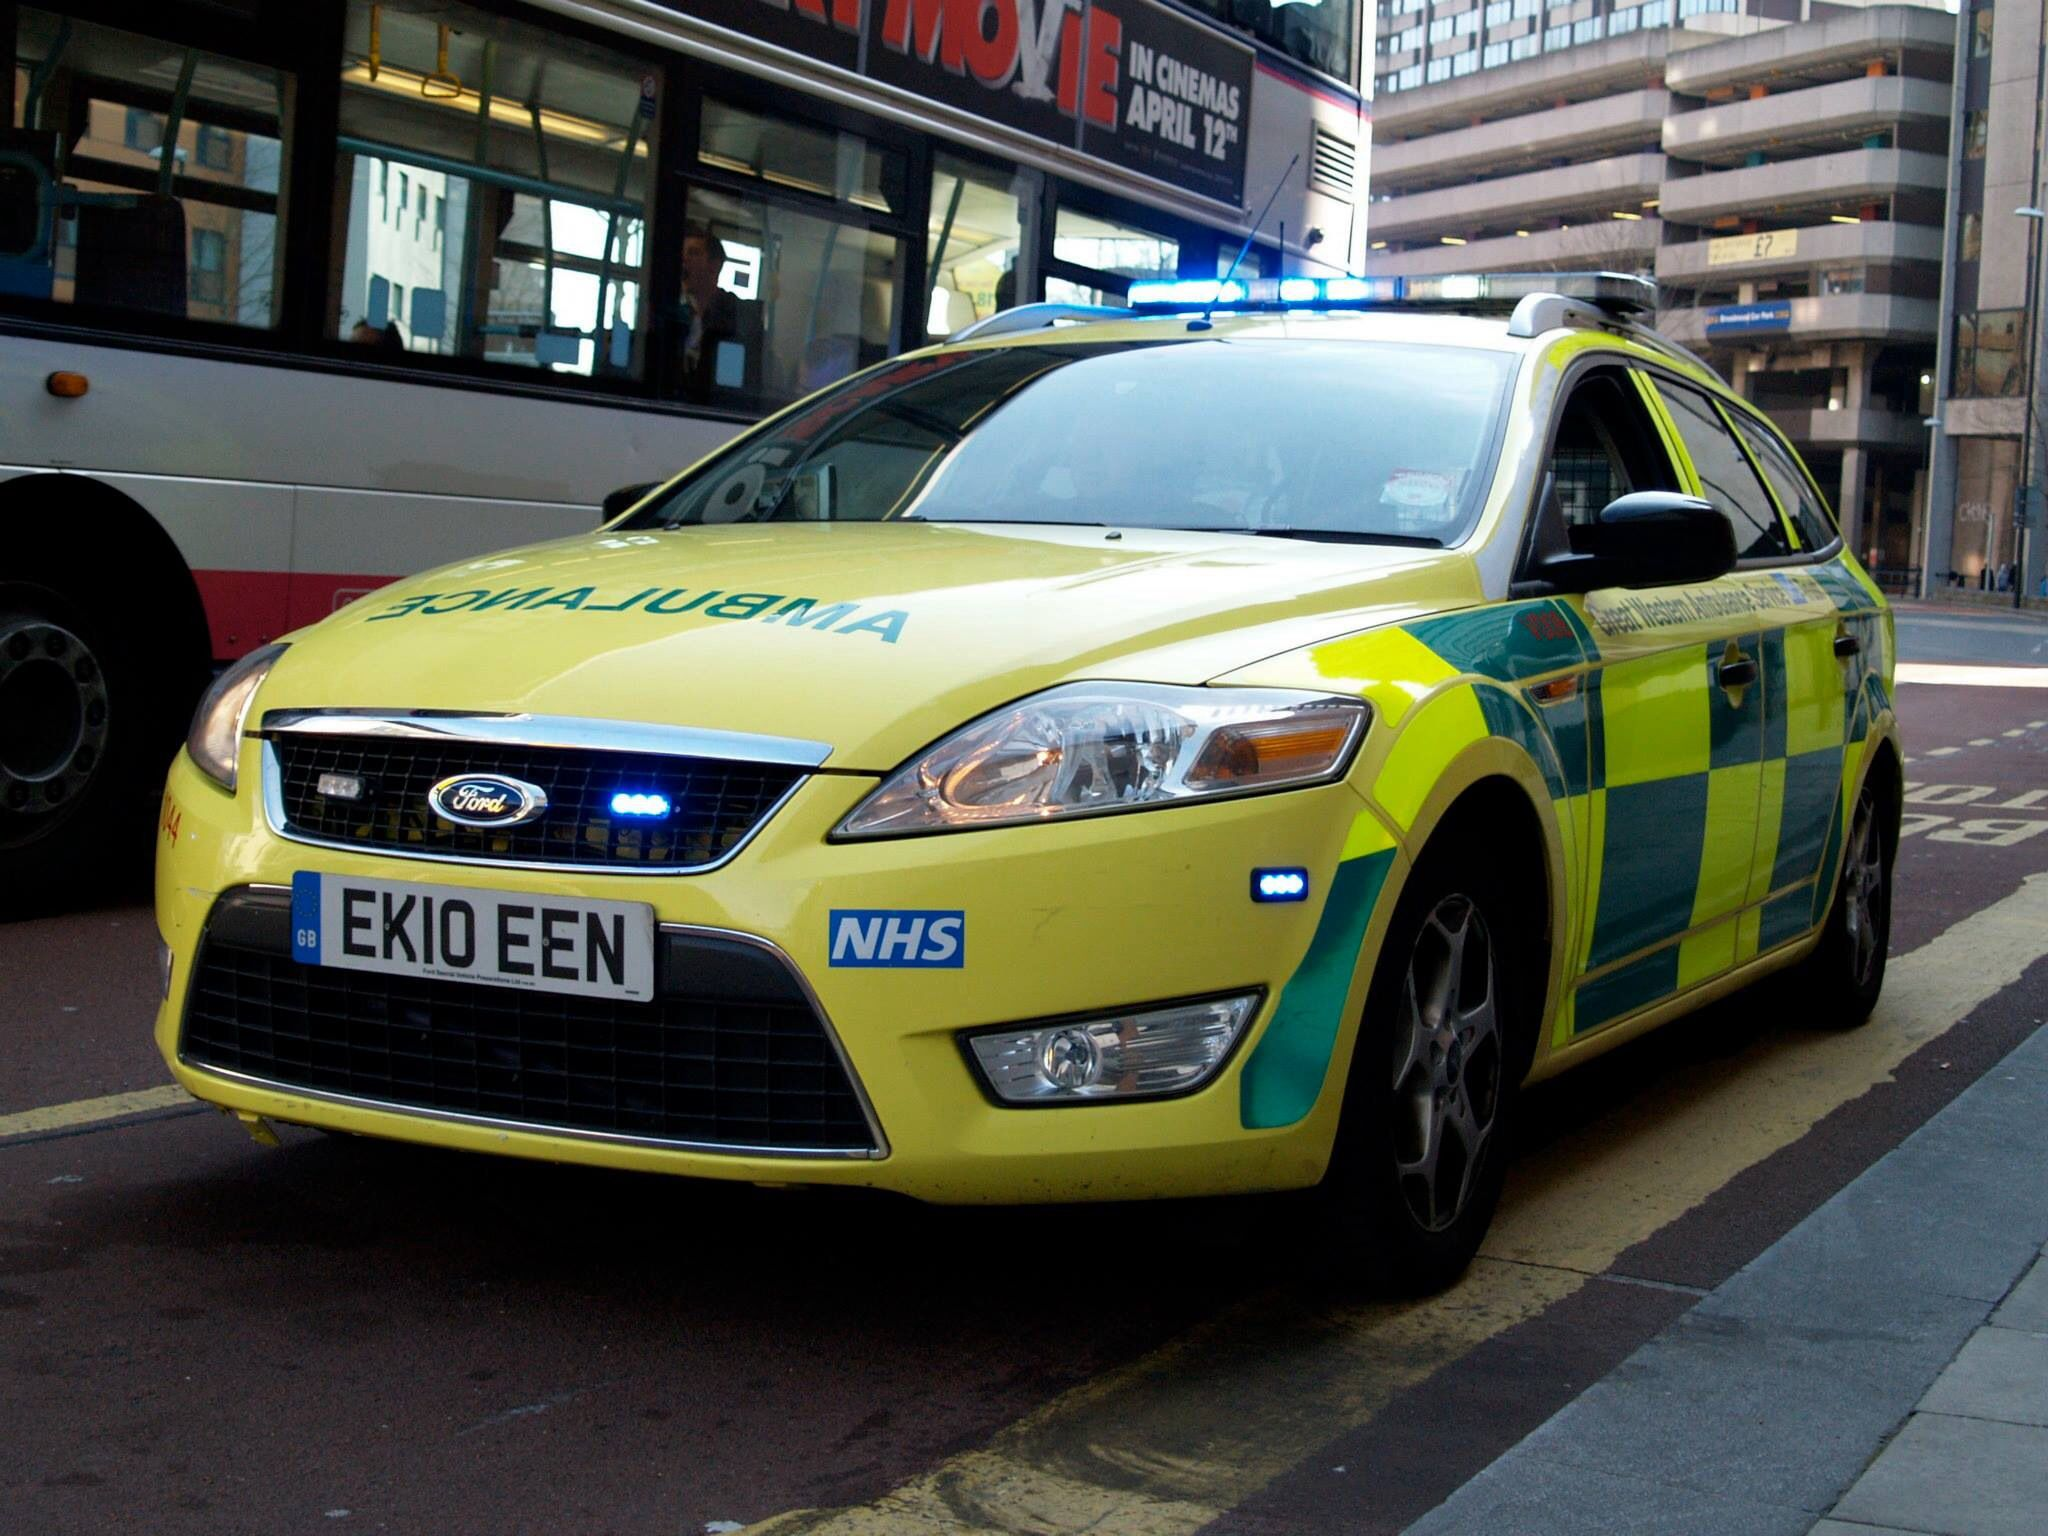 Bluelighttim Rescue Vehicles Emergency Response Dr Car